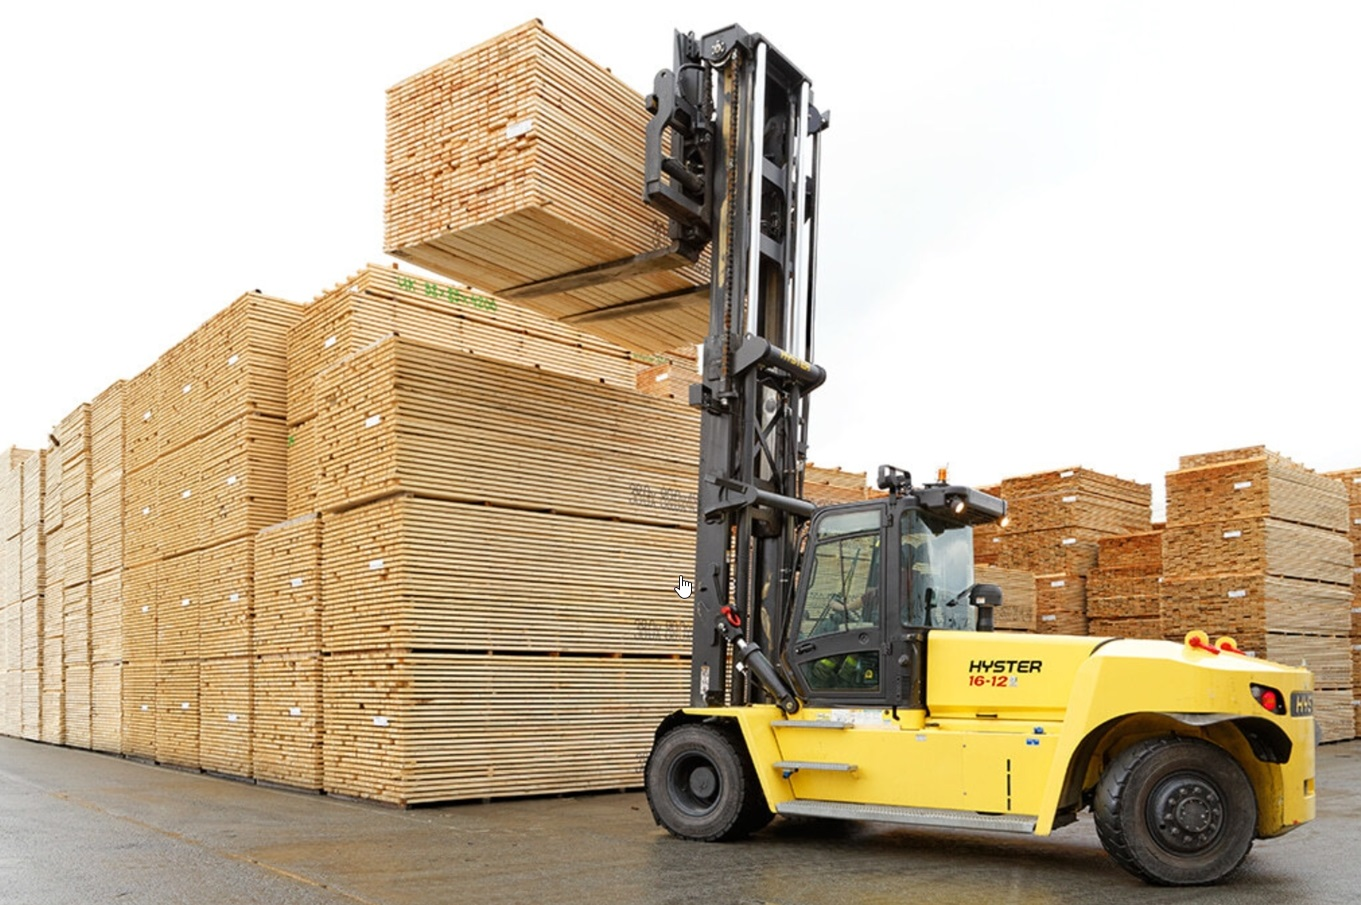 carretilla elevadora grande Hyster manipulando madera